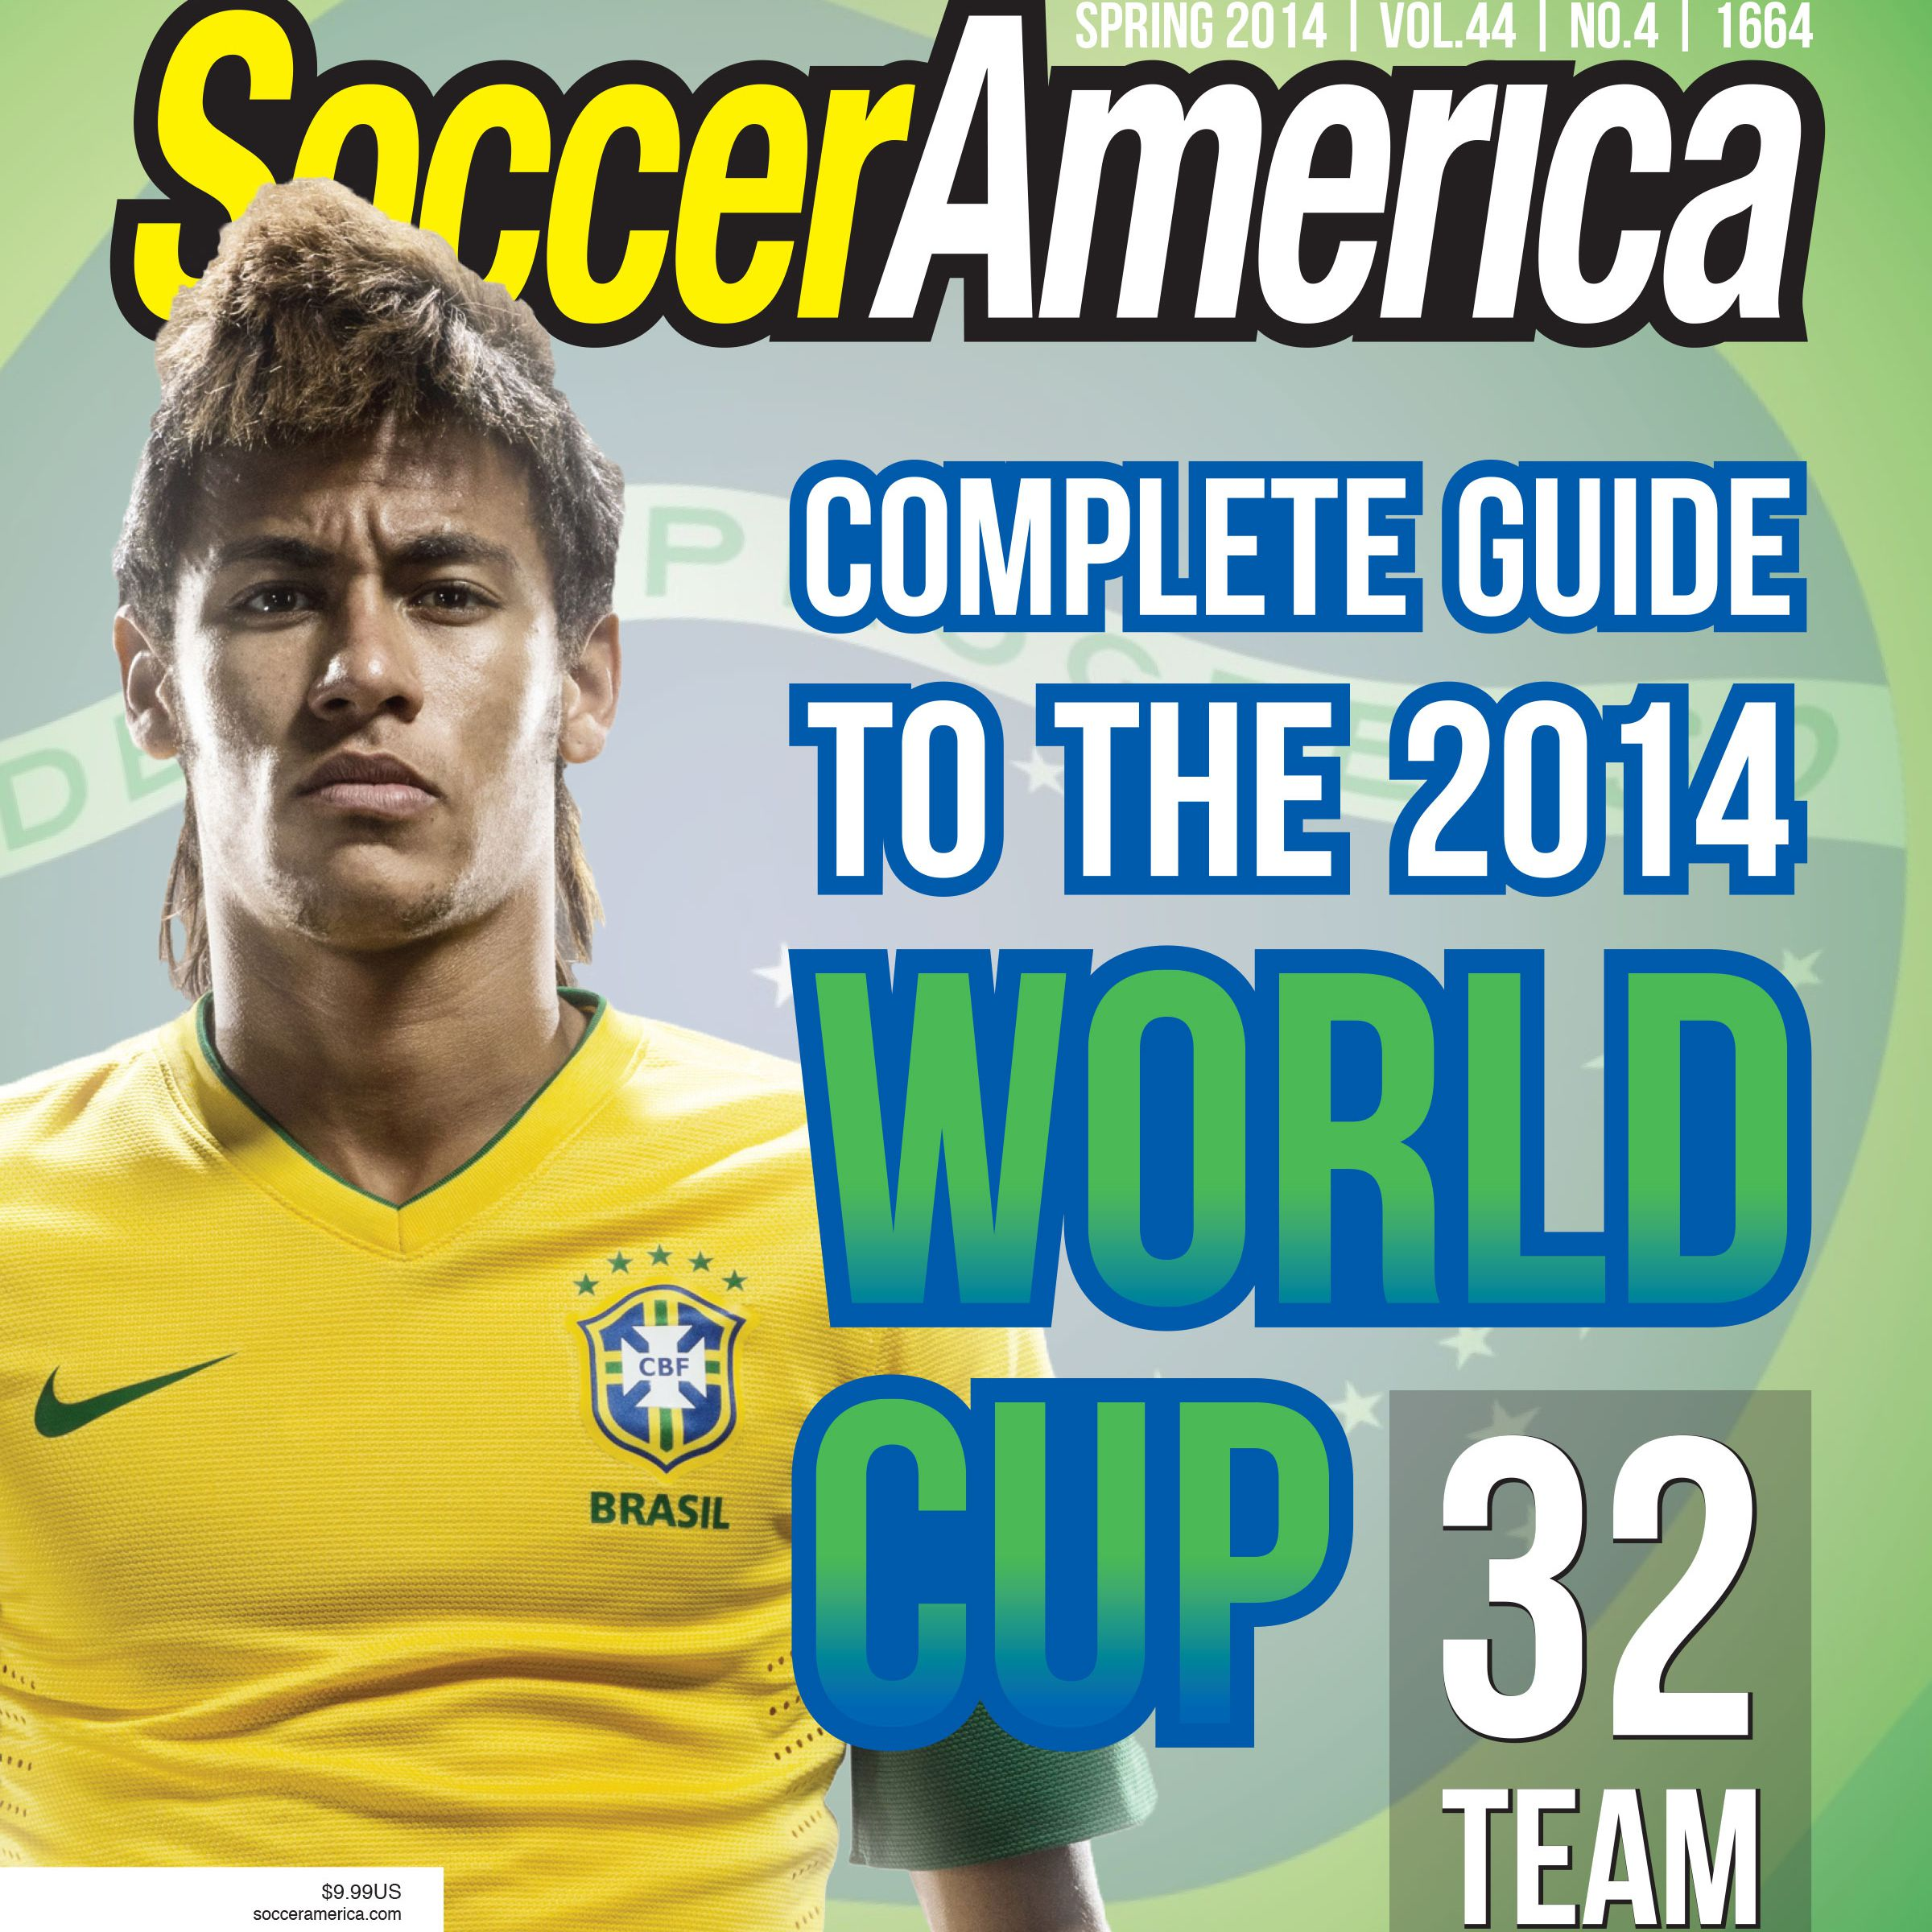 Cover of Soccer America magazine